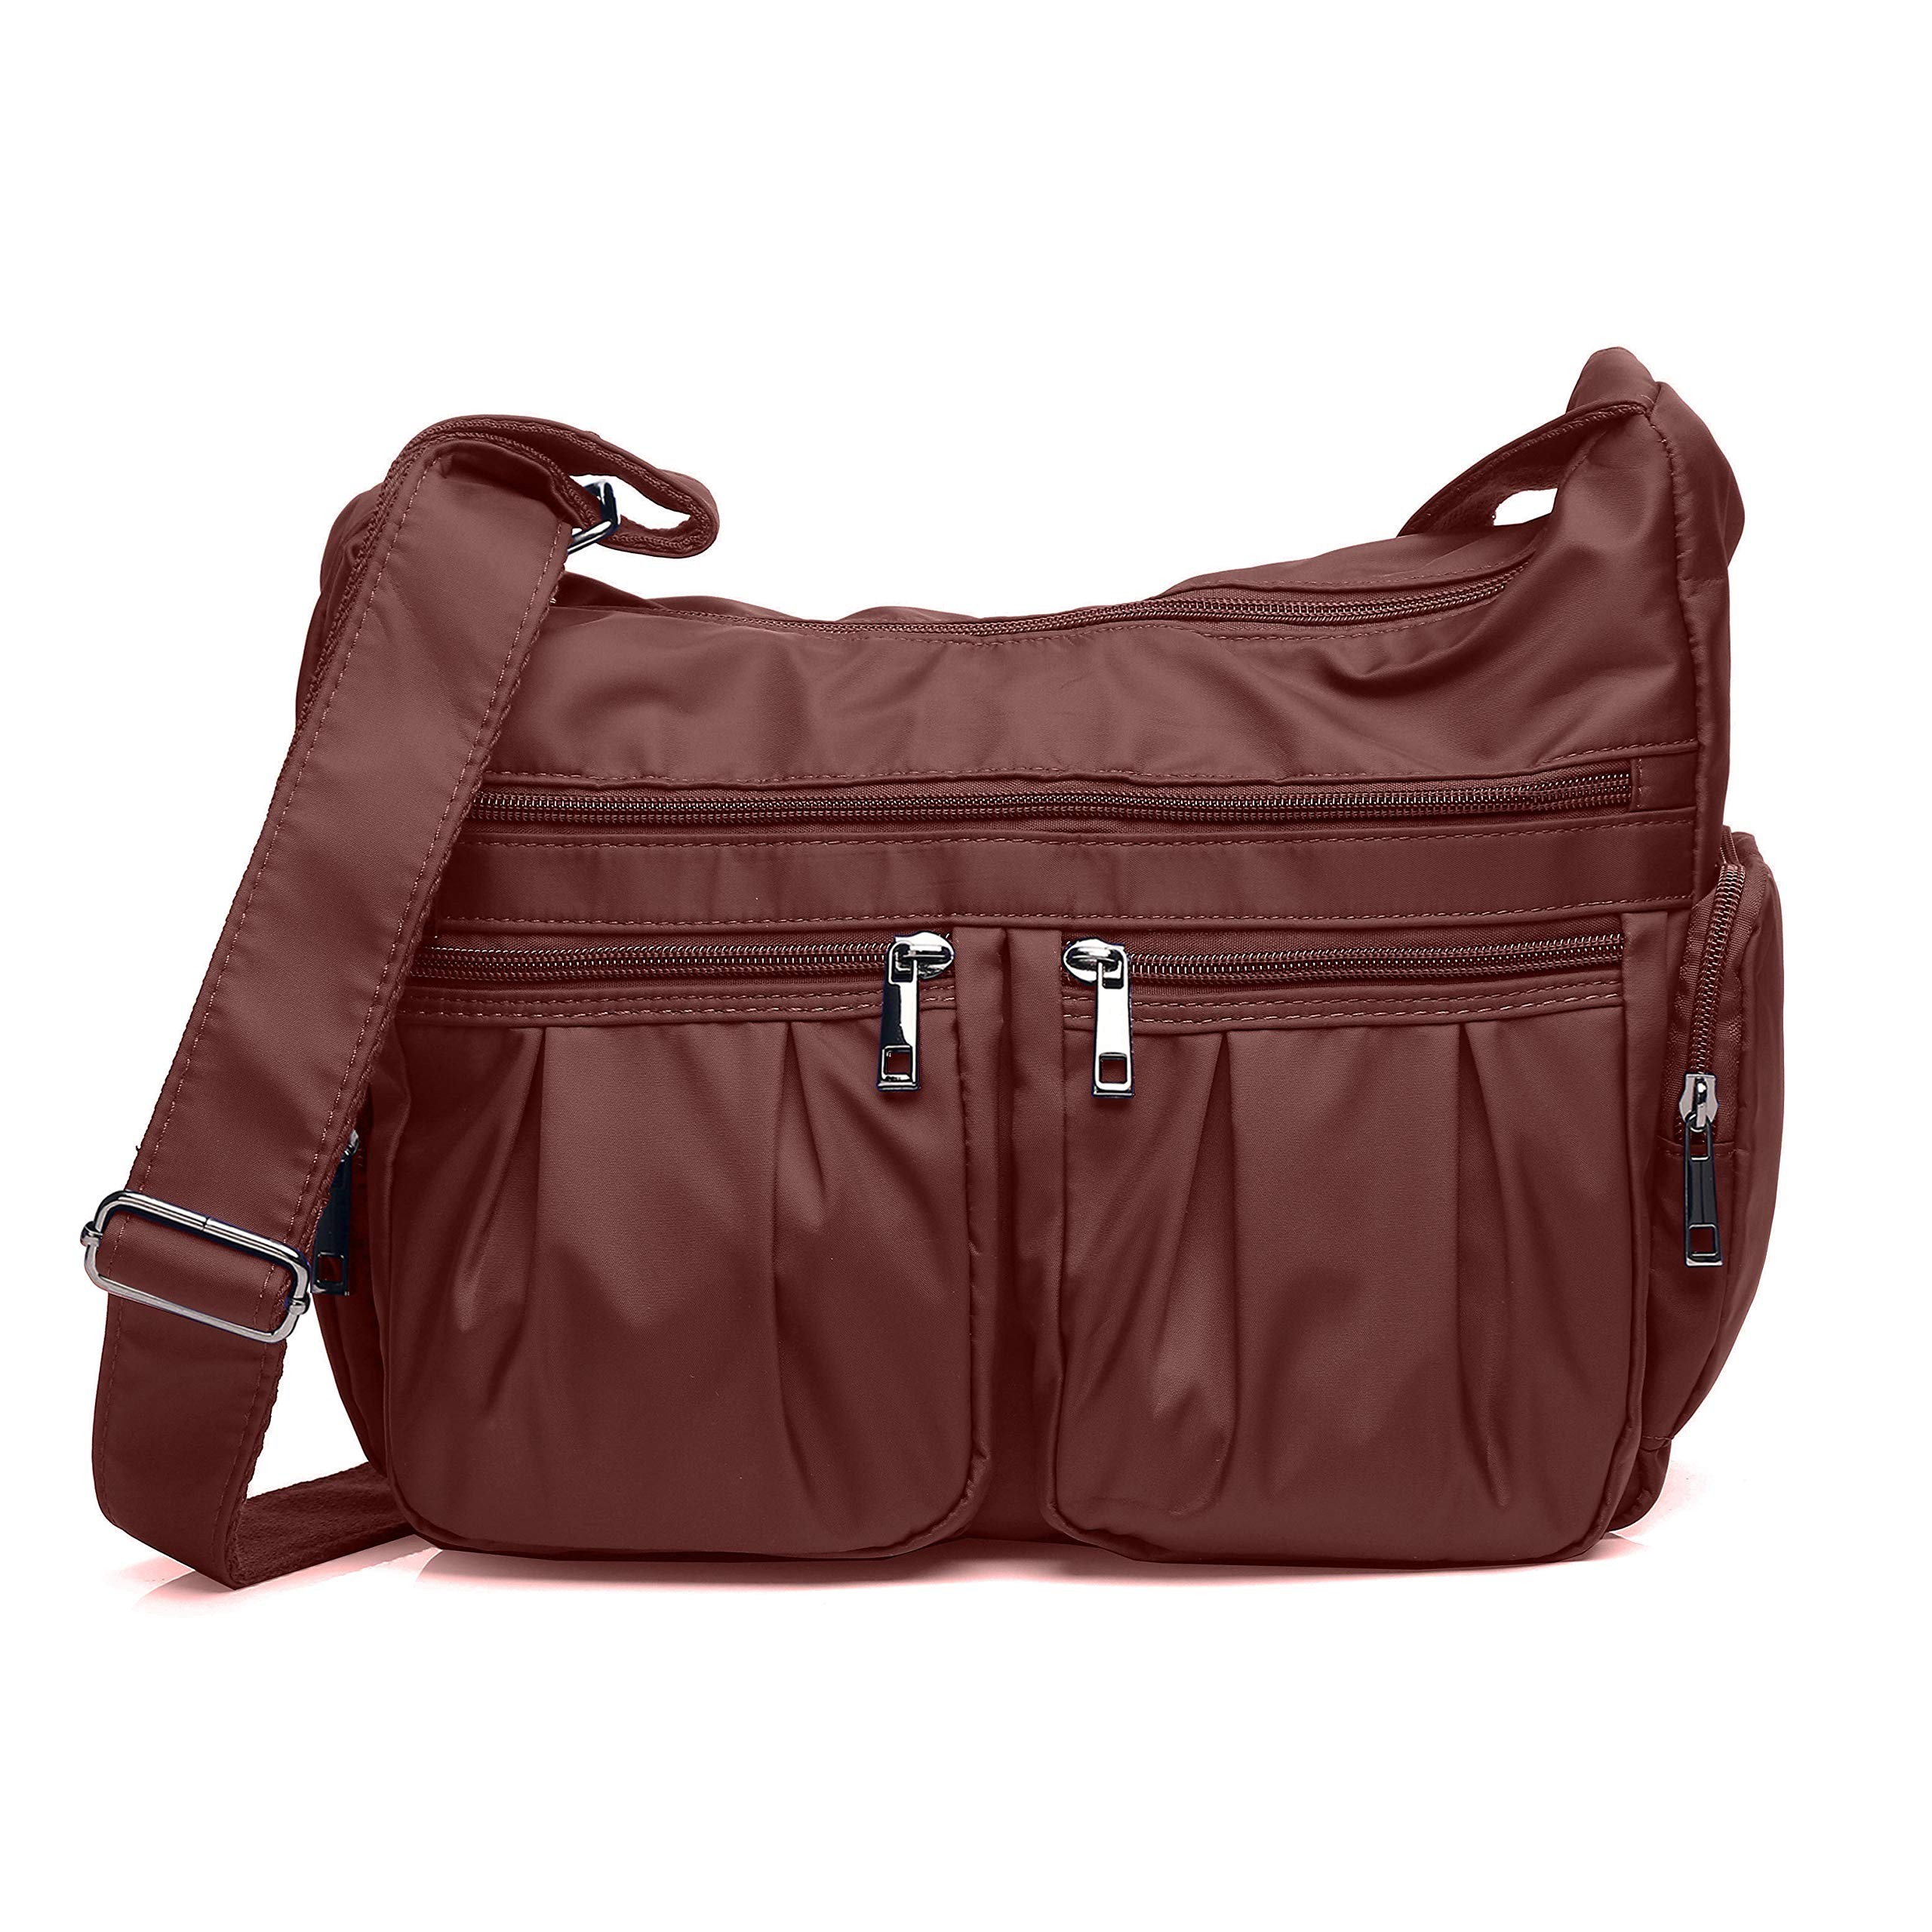 55d21b8ea1b6 Crossbody Bags for Women, Multi Pocket - TiendaMIA.com